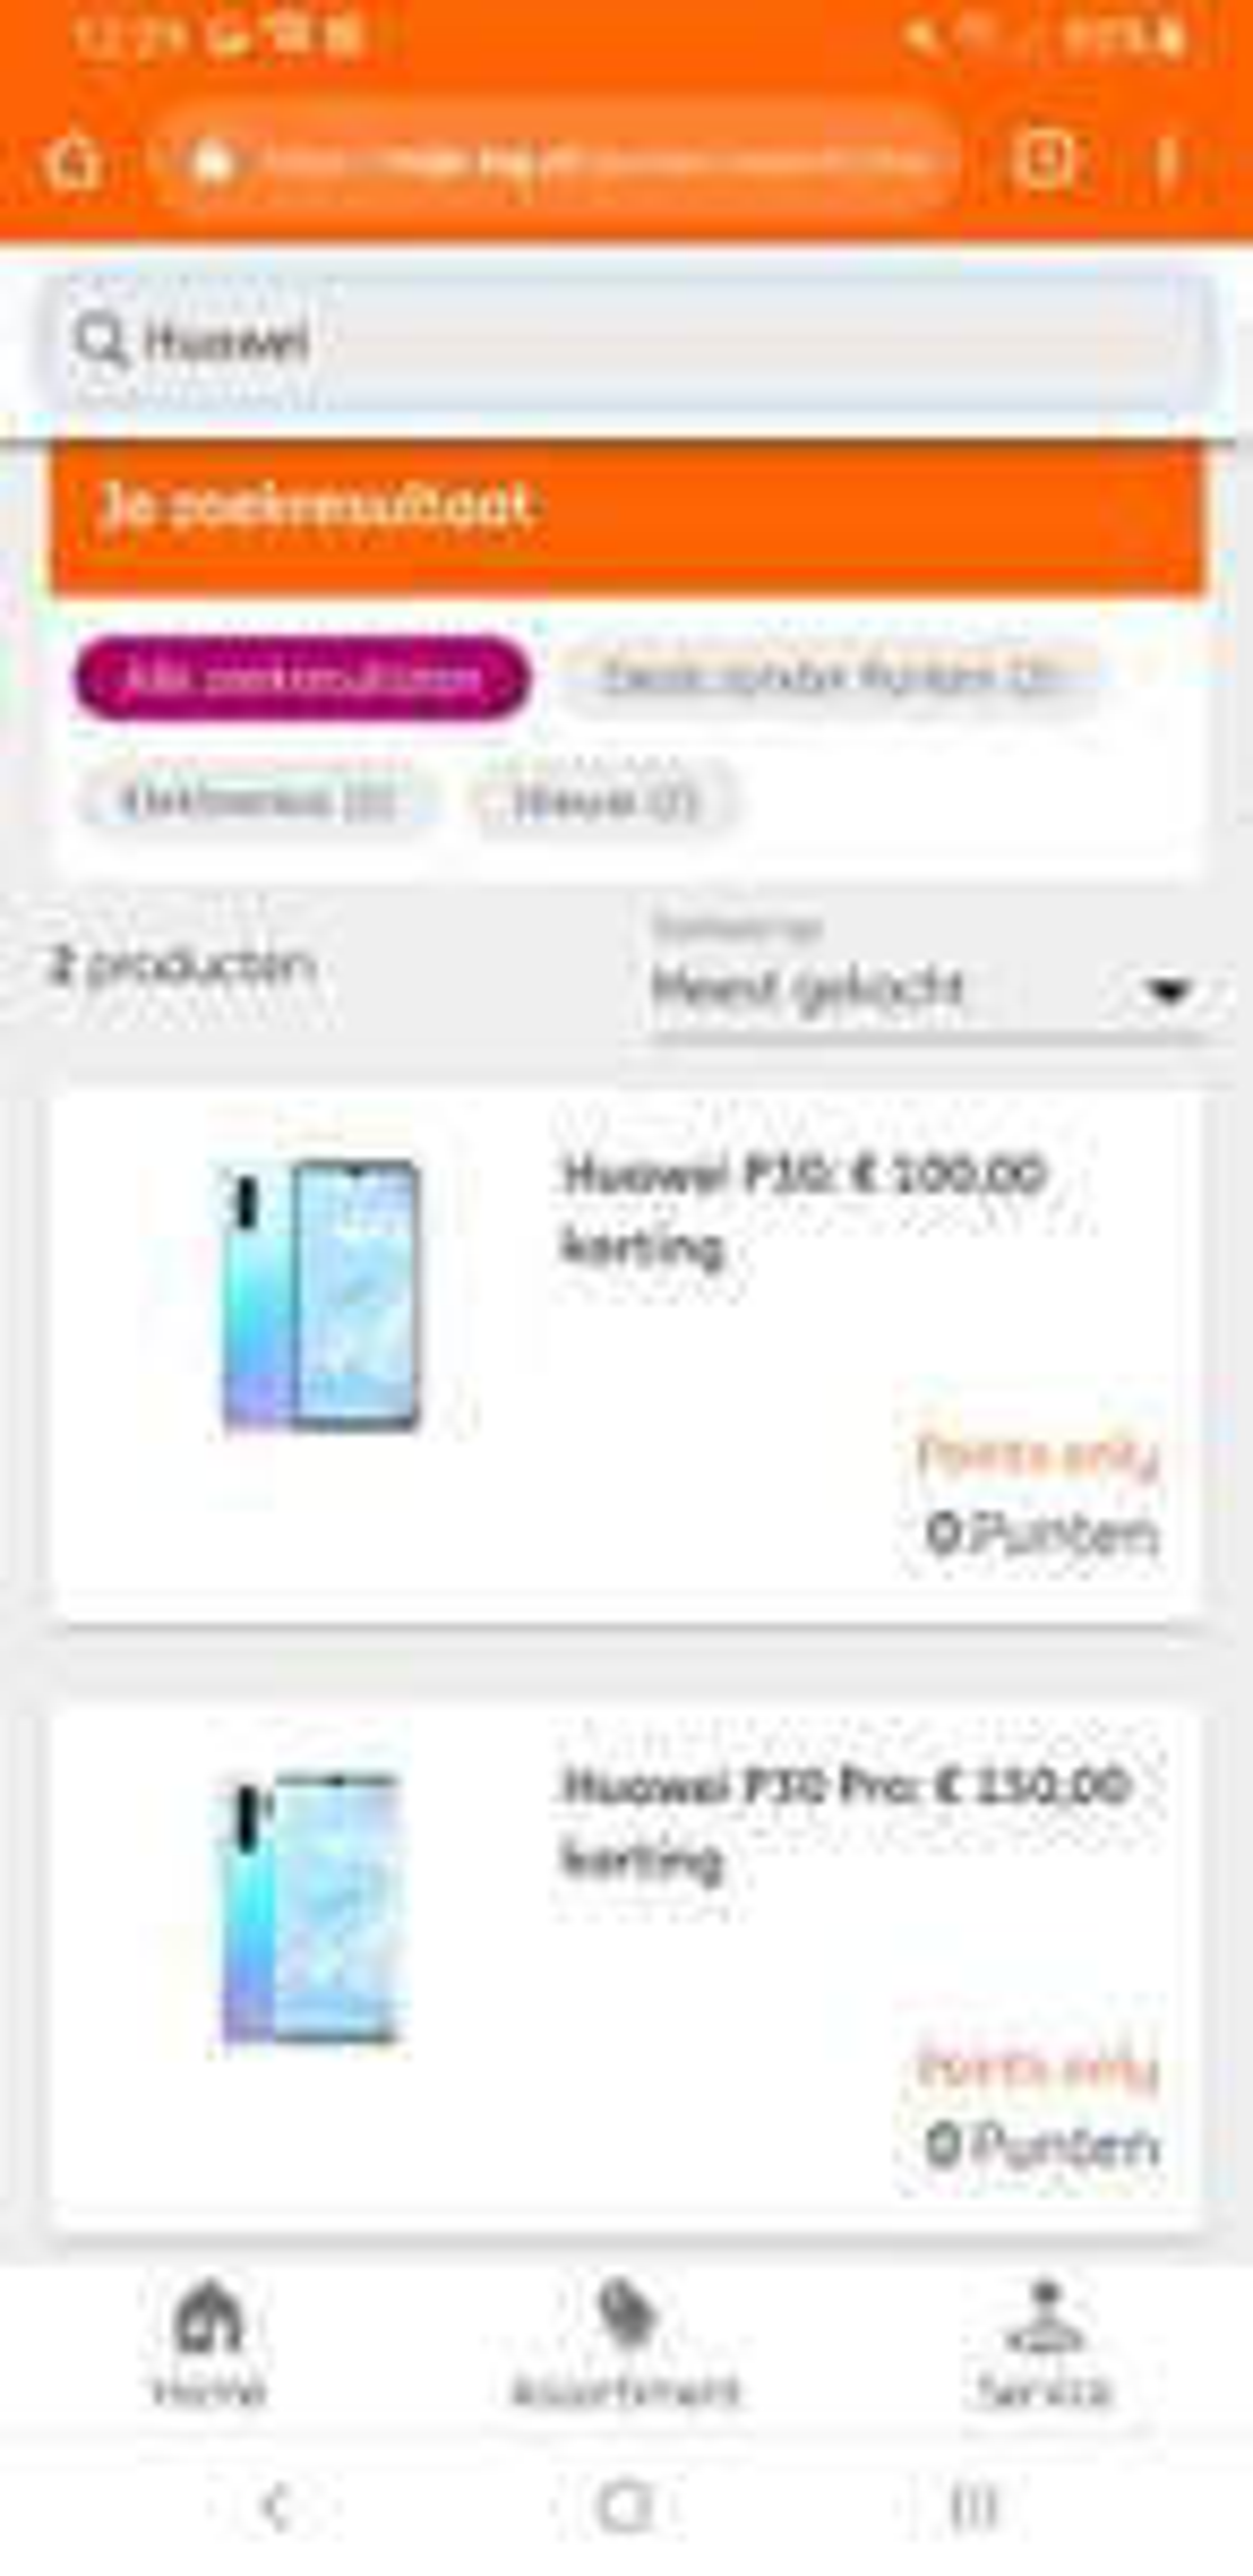 100 of 150 euro korting op de huawei p30 ( pro ) via ing en mobiel.nl